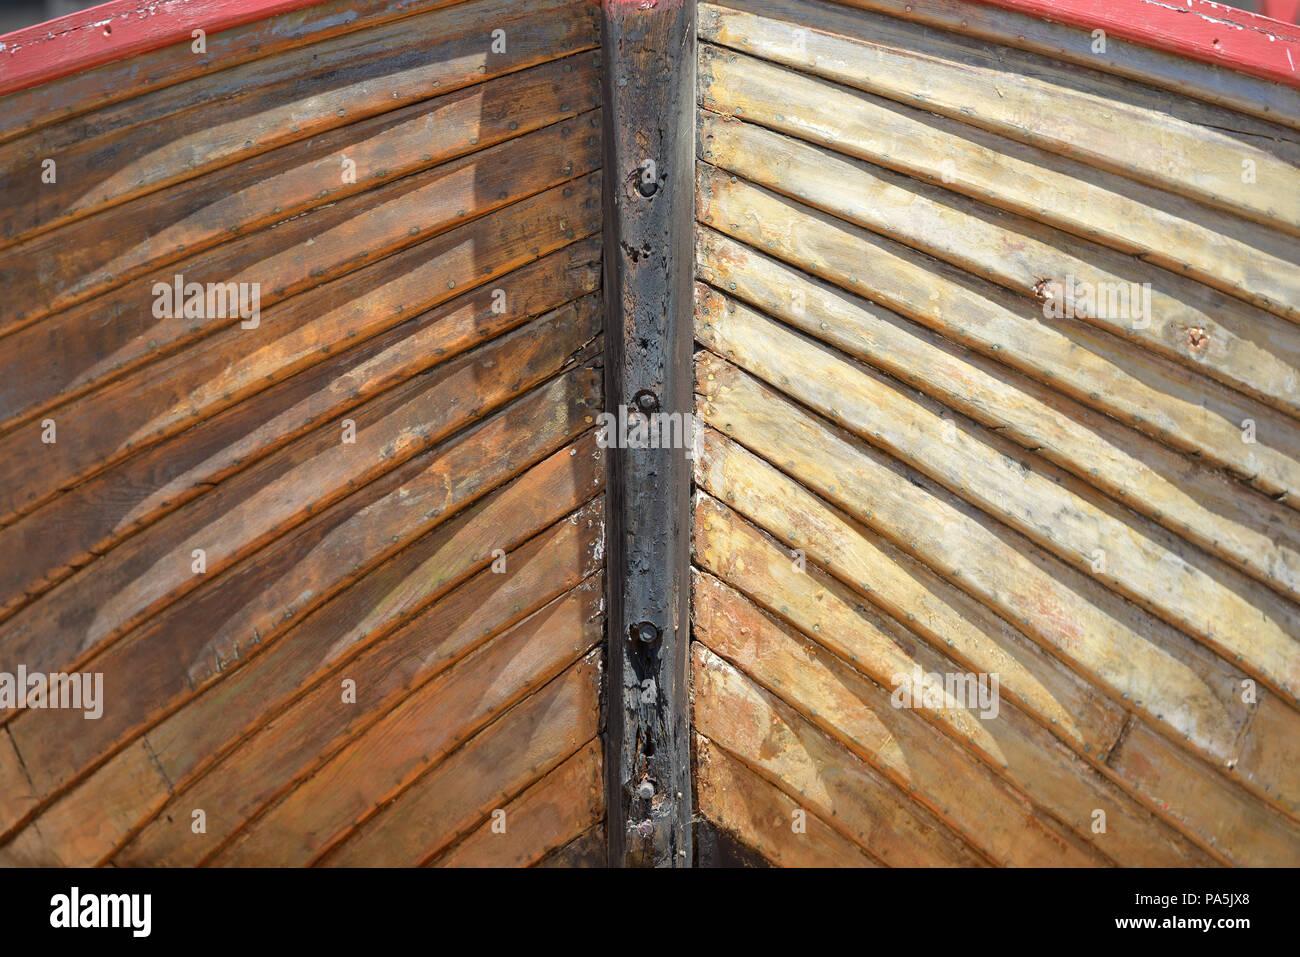 Vintage Wooden Boat Stock Photos Amp Vintage Wooden Boat